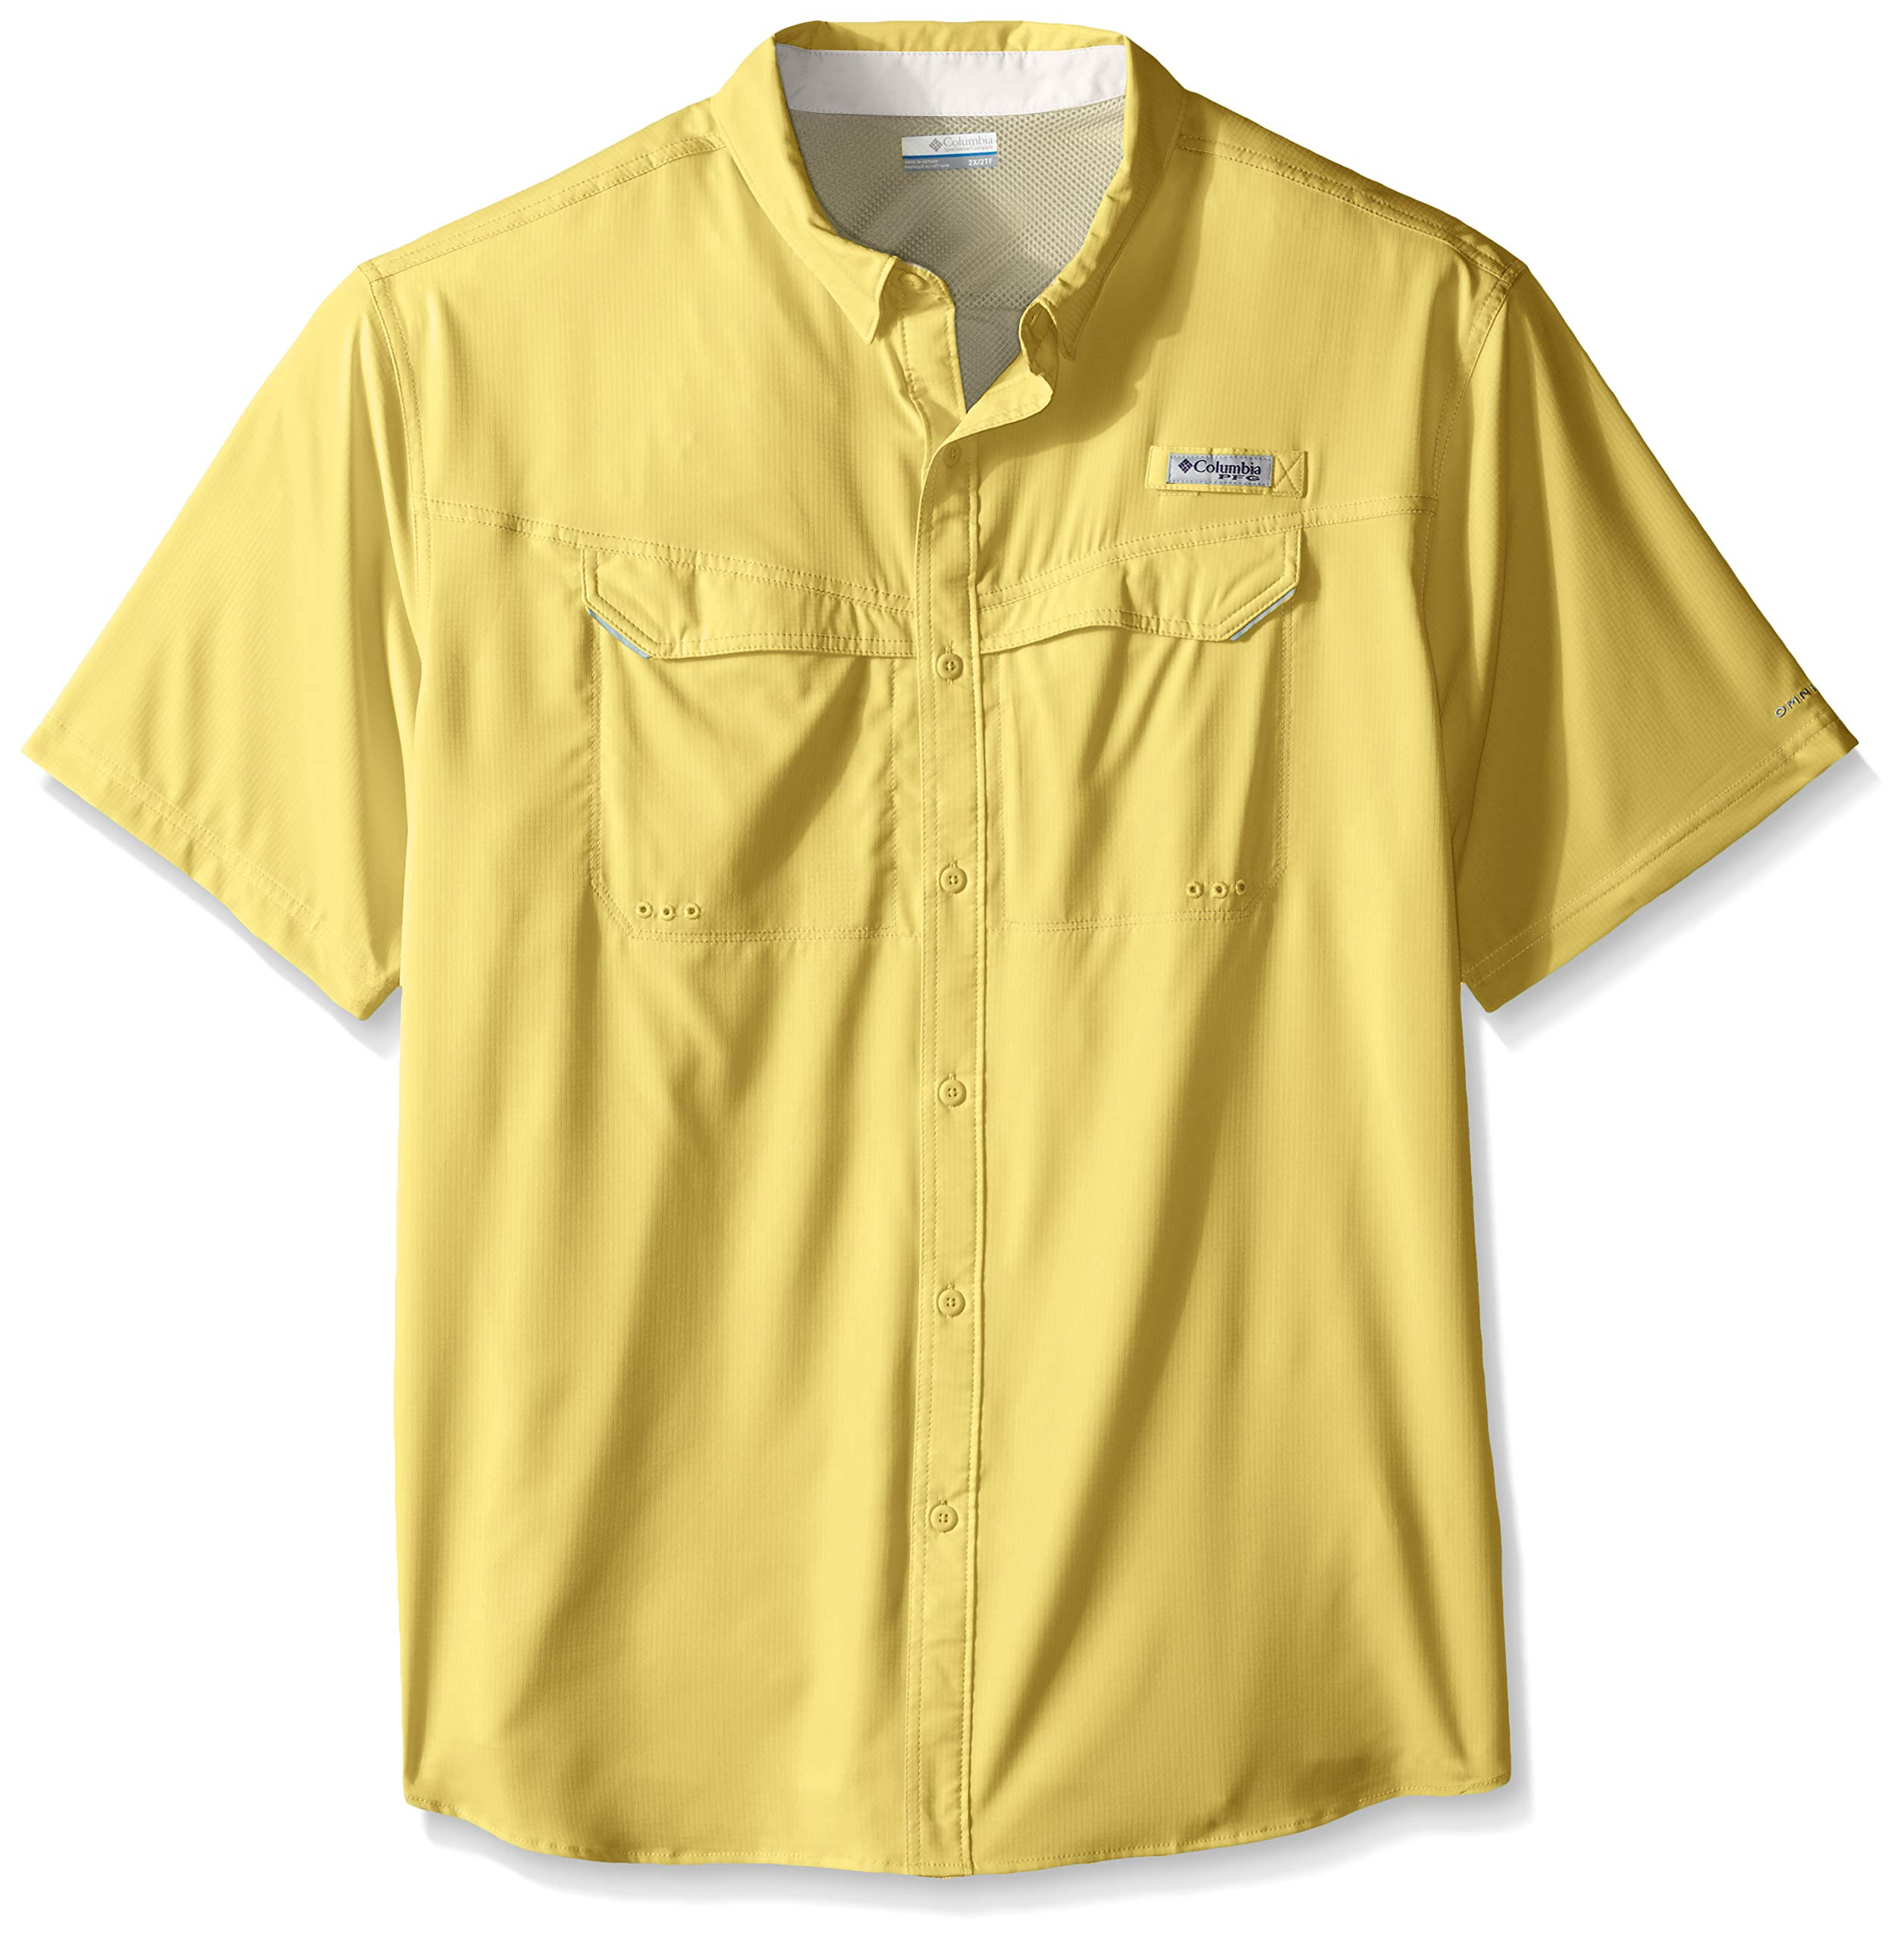 Columbia Men's Low Drag Offshore Short Sleeve Shirt, Sunlit, 4X